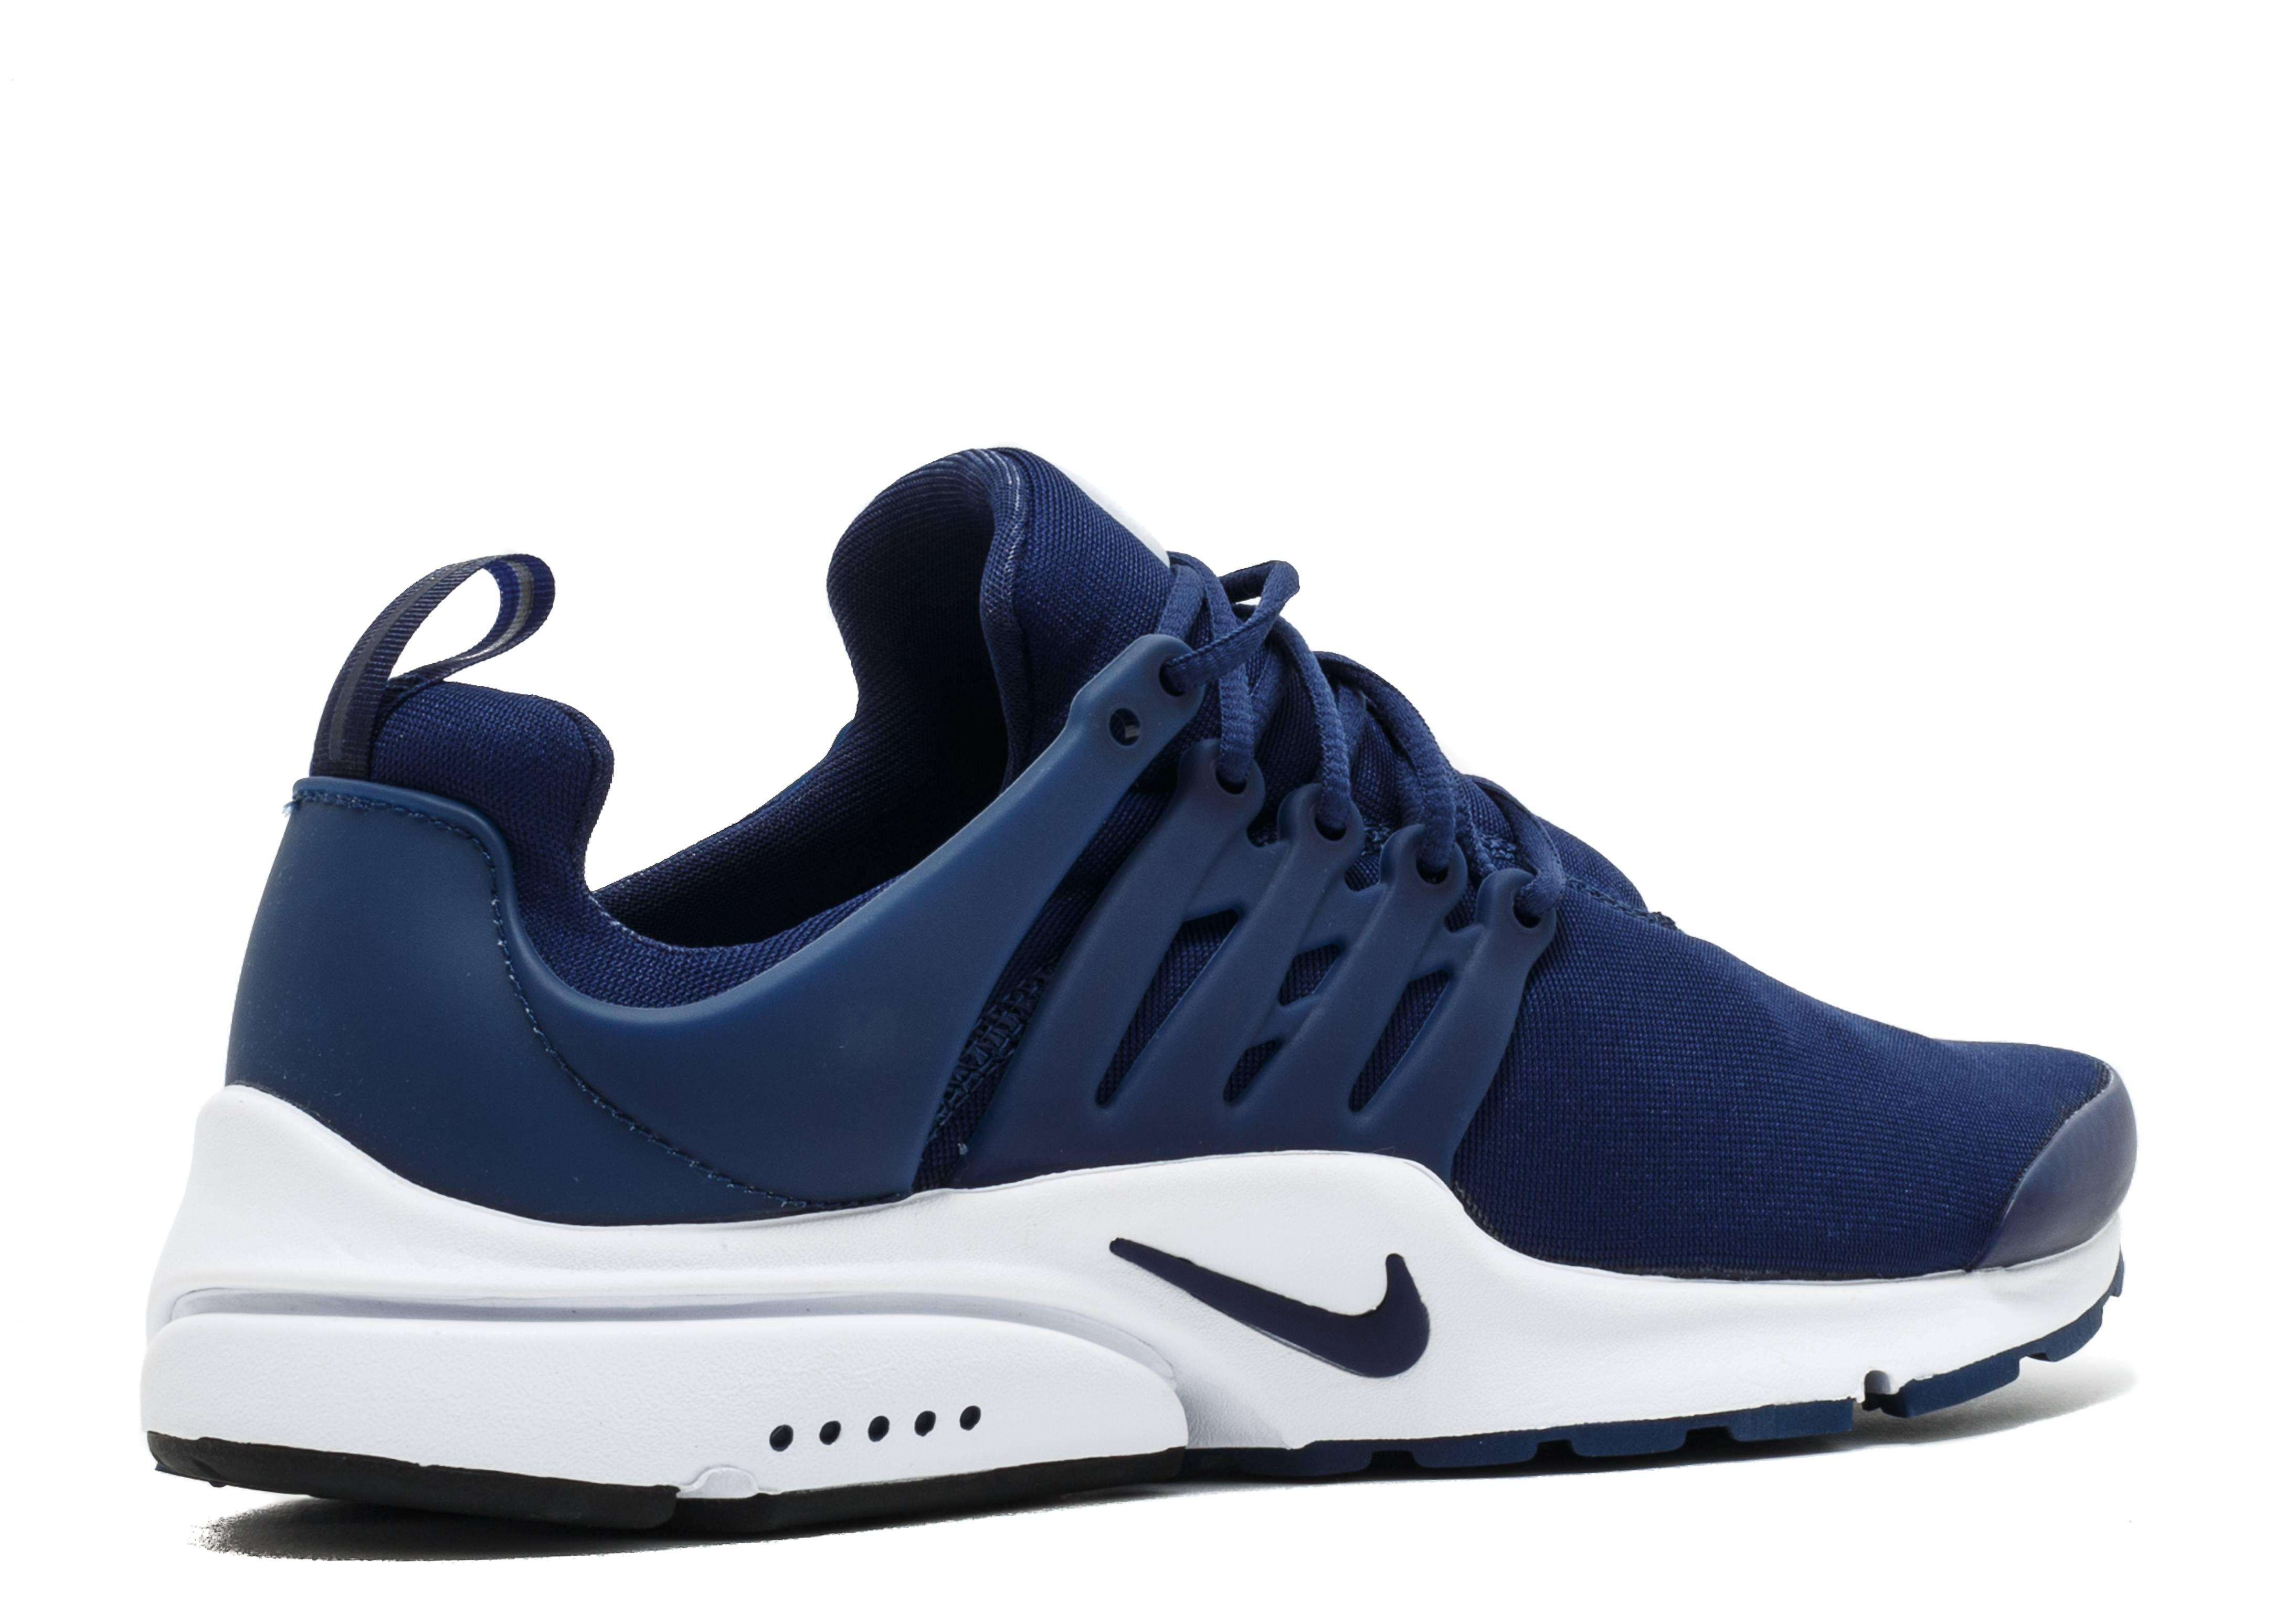 Nike Air Presto Essential - Nike - 848187 402 - binary blue binary blue- white  5b78cf1e0